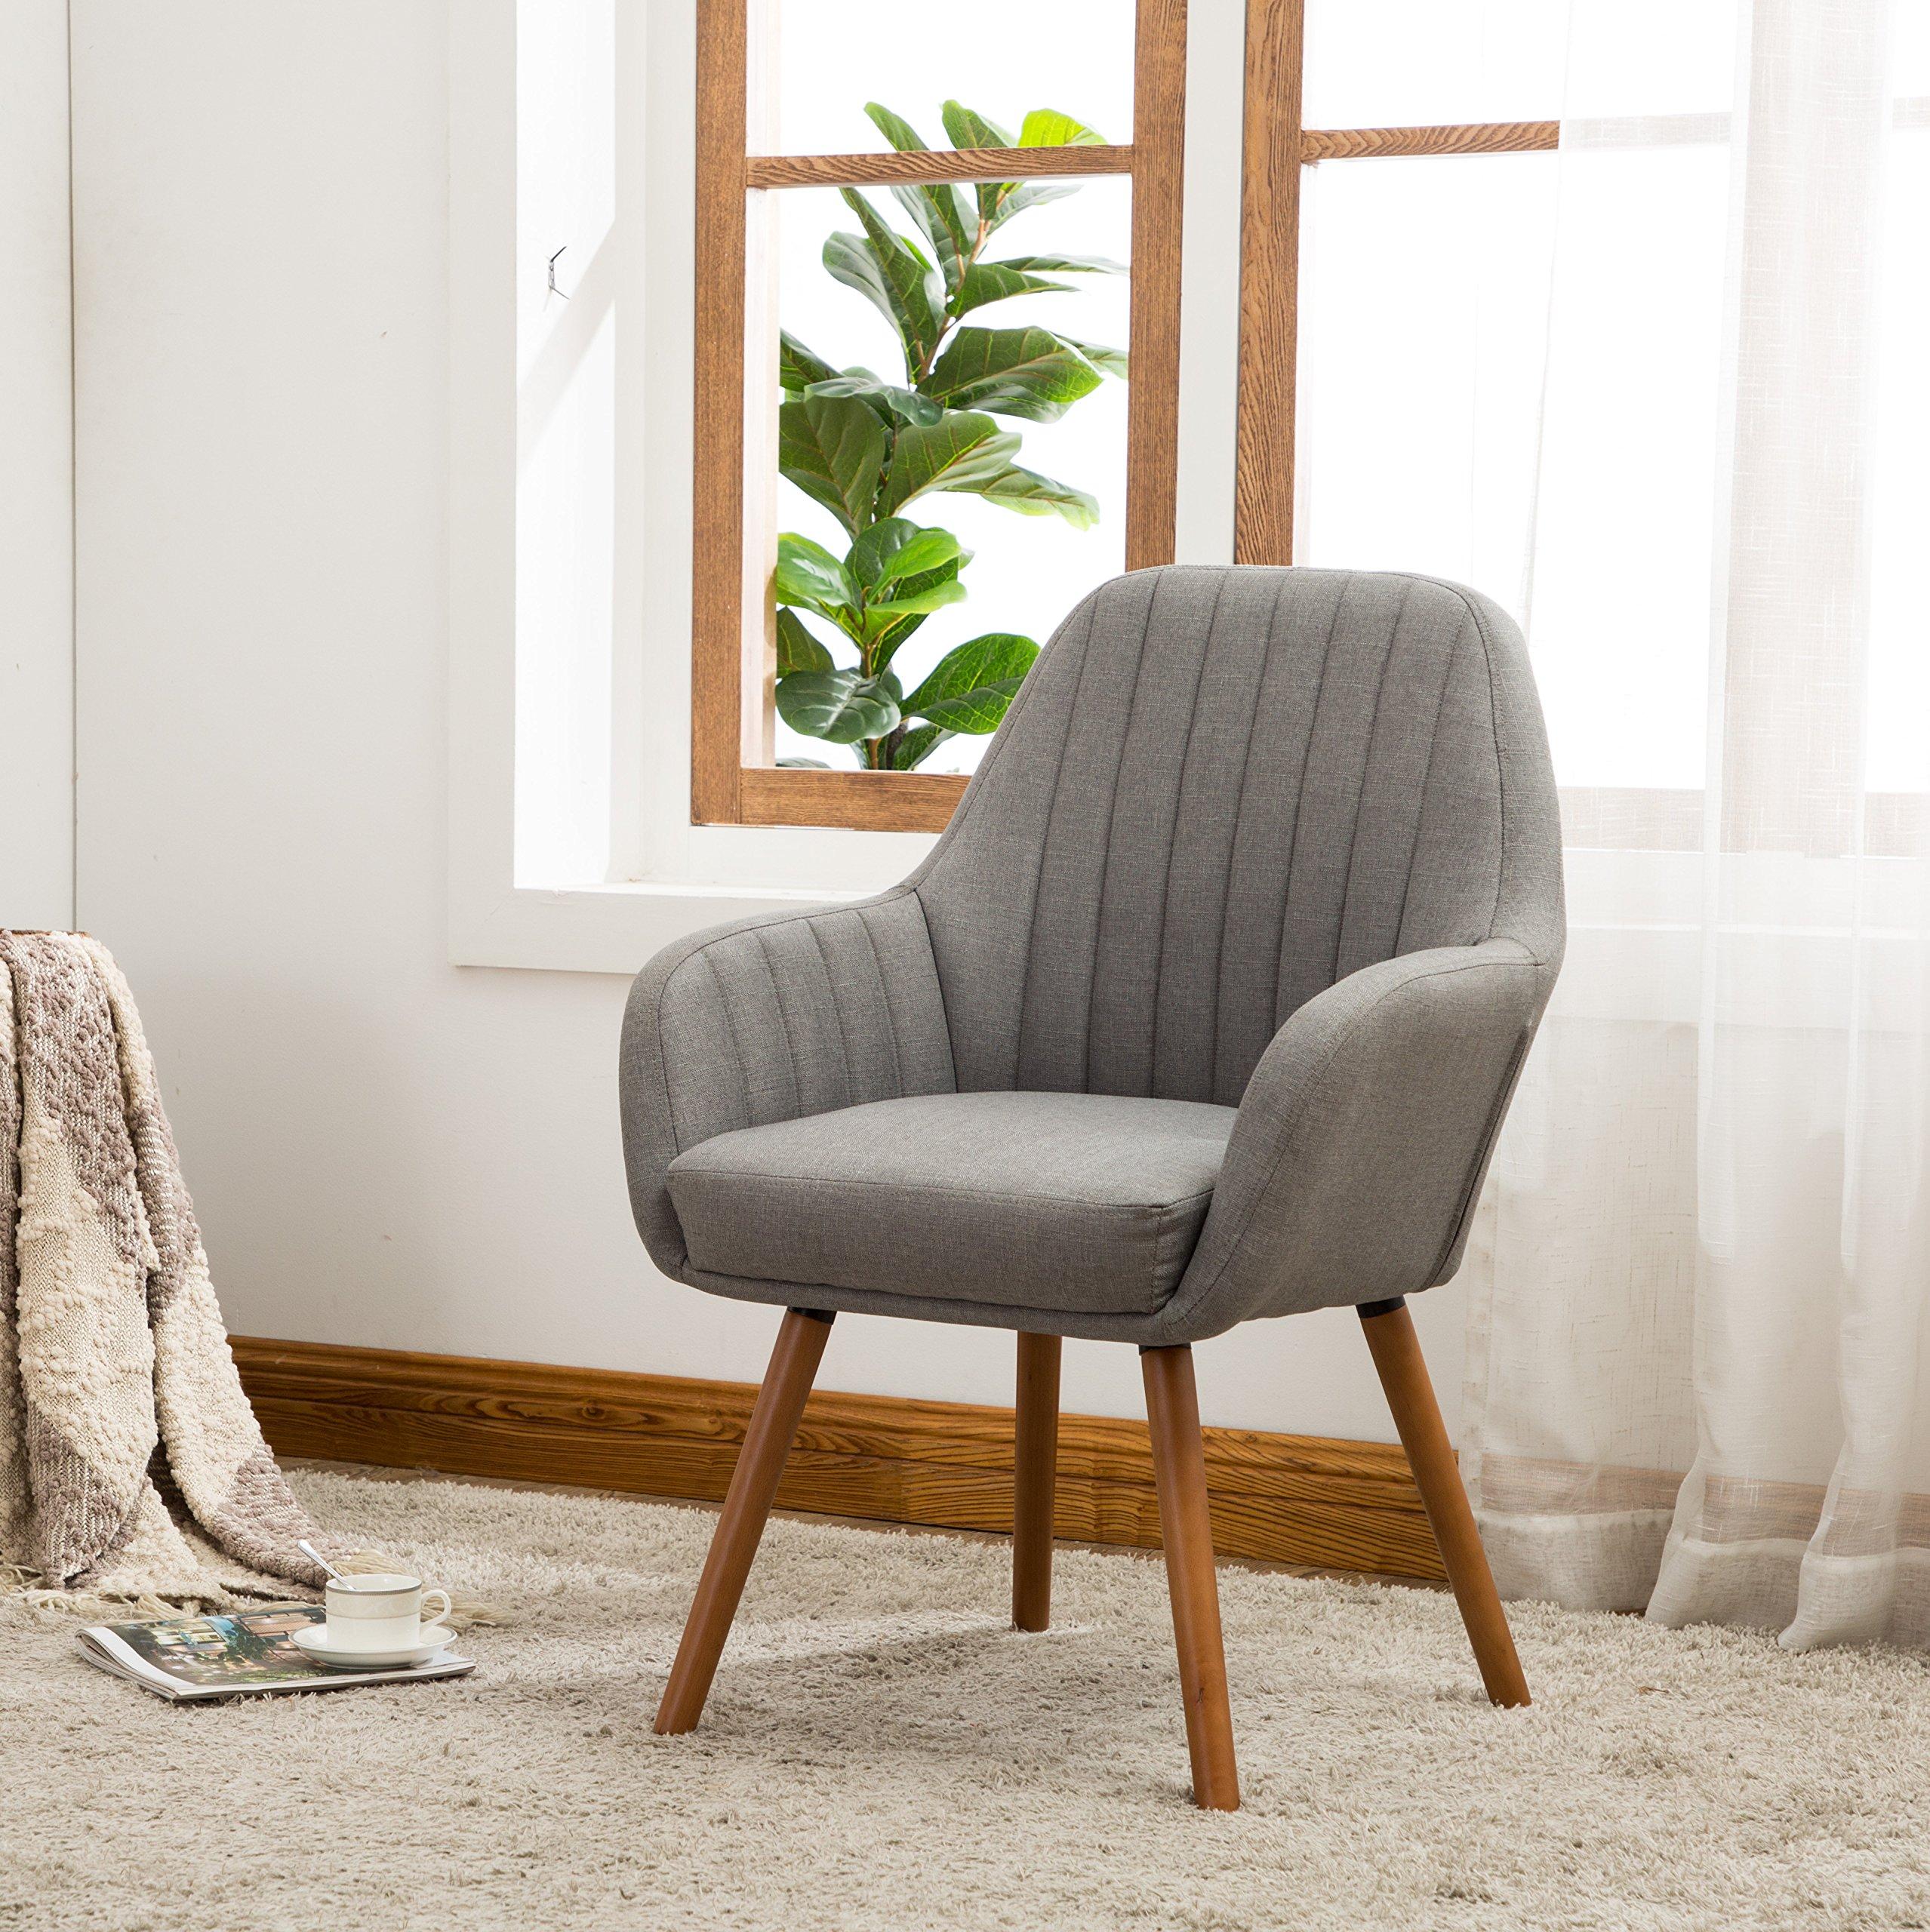 Roundhill Furniture Tuchico Contemporary Fabric Accent Chair, Gray by Roundhill Furniture